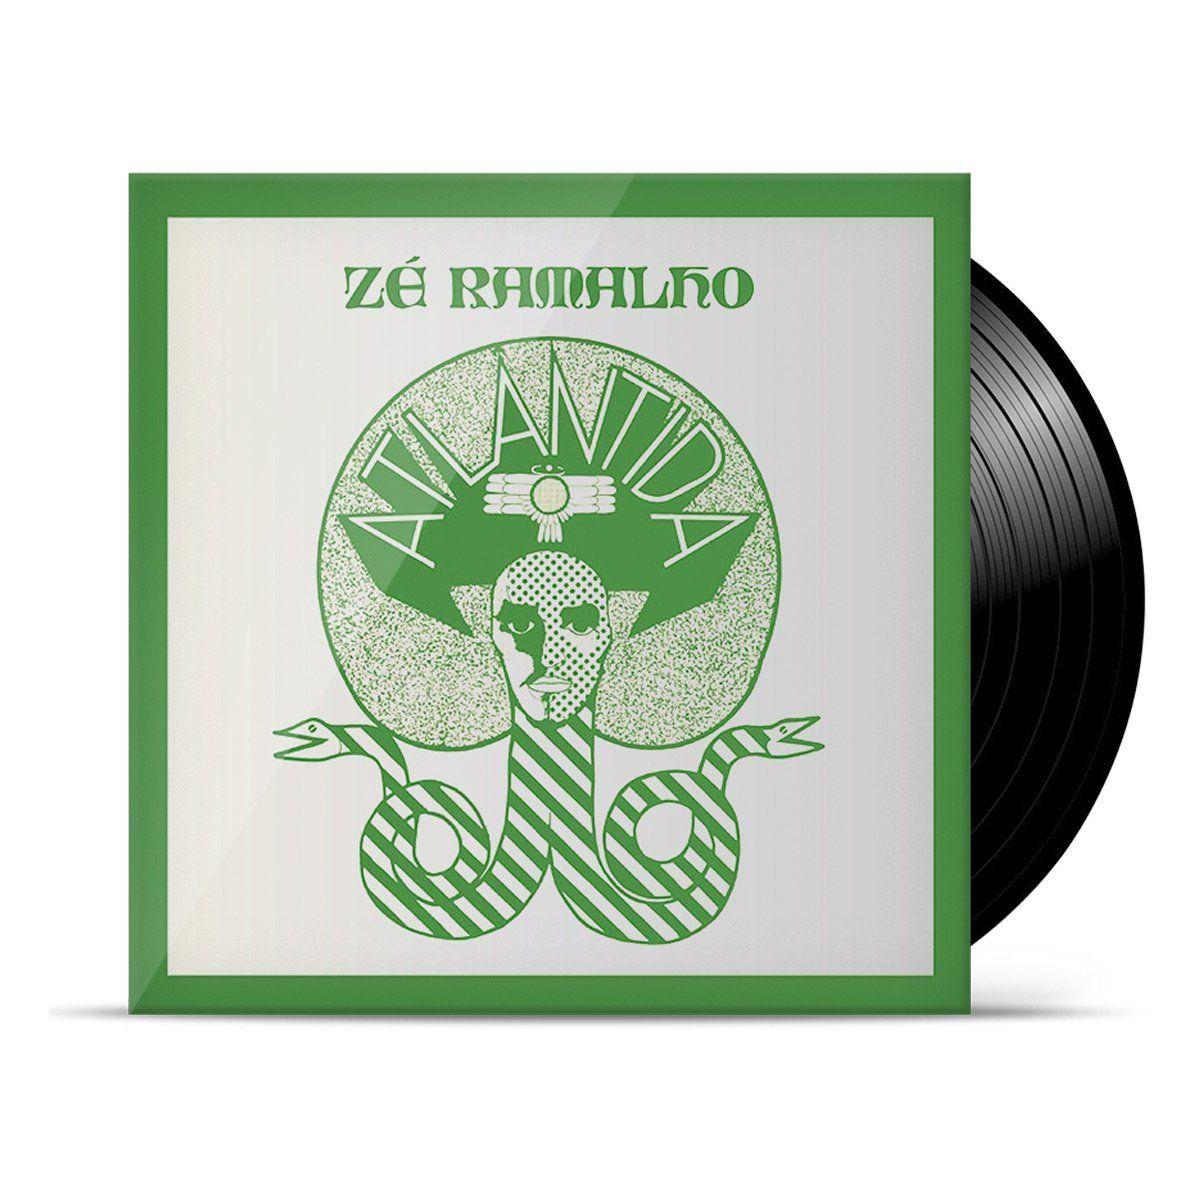 LP Zé Ramalho Atlântida  - bandUP Store Marketplace